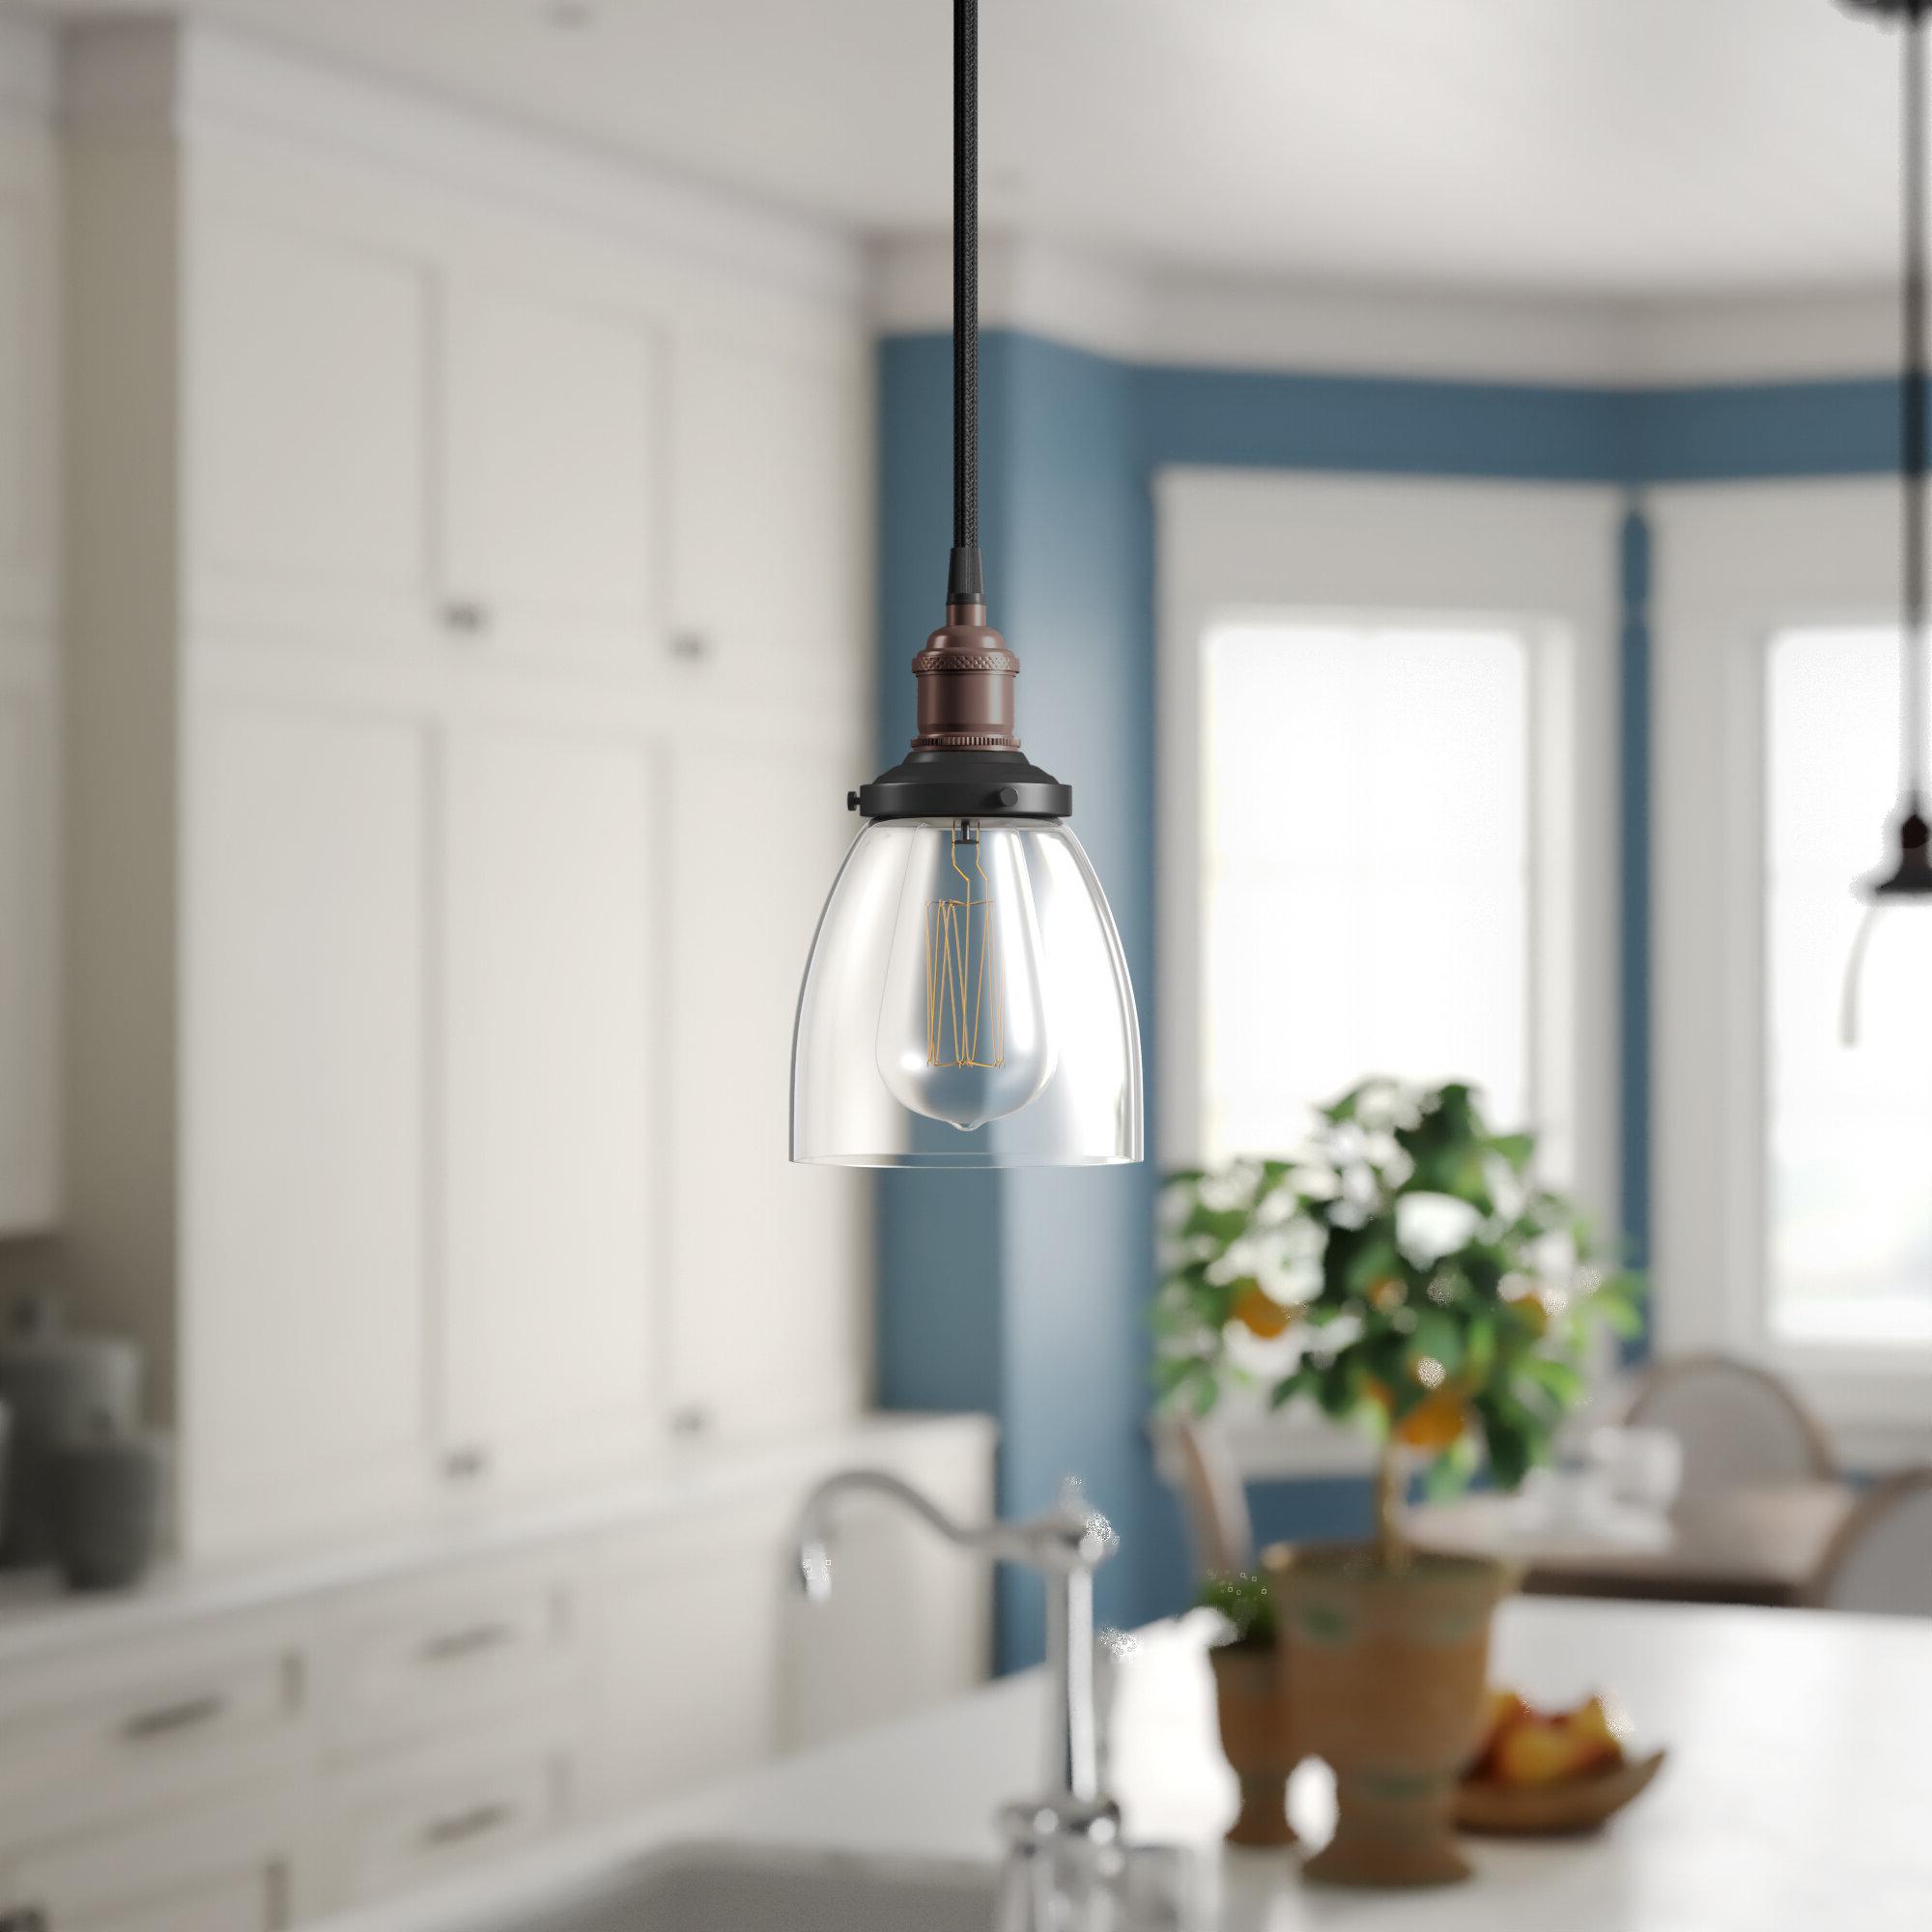 Trendy Sandy Springs 1 Light Single Bell Pendant Intended For Bundaberg 1 Light Single Bell Pendants (View 15 of 20)